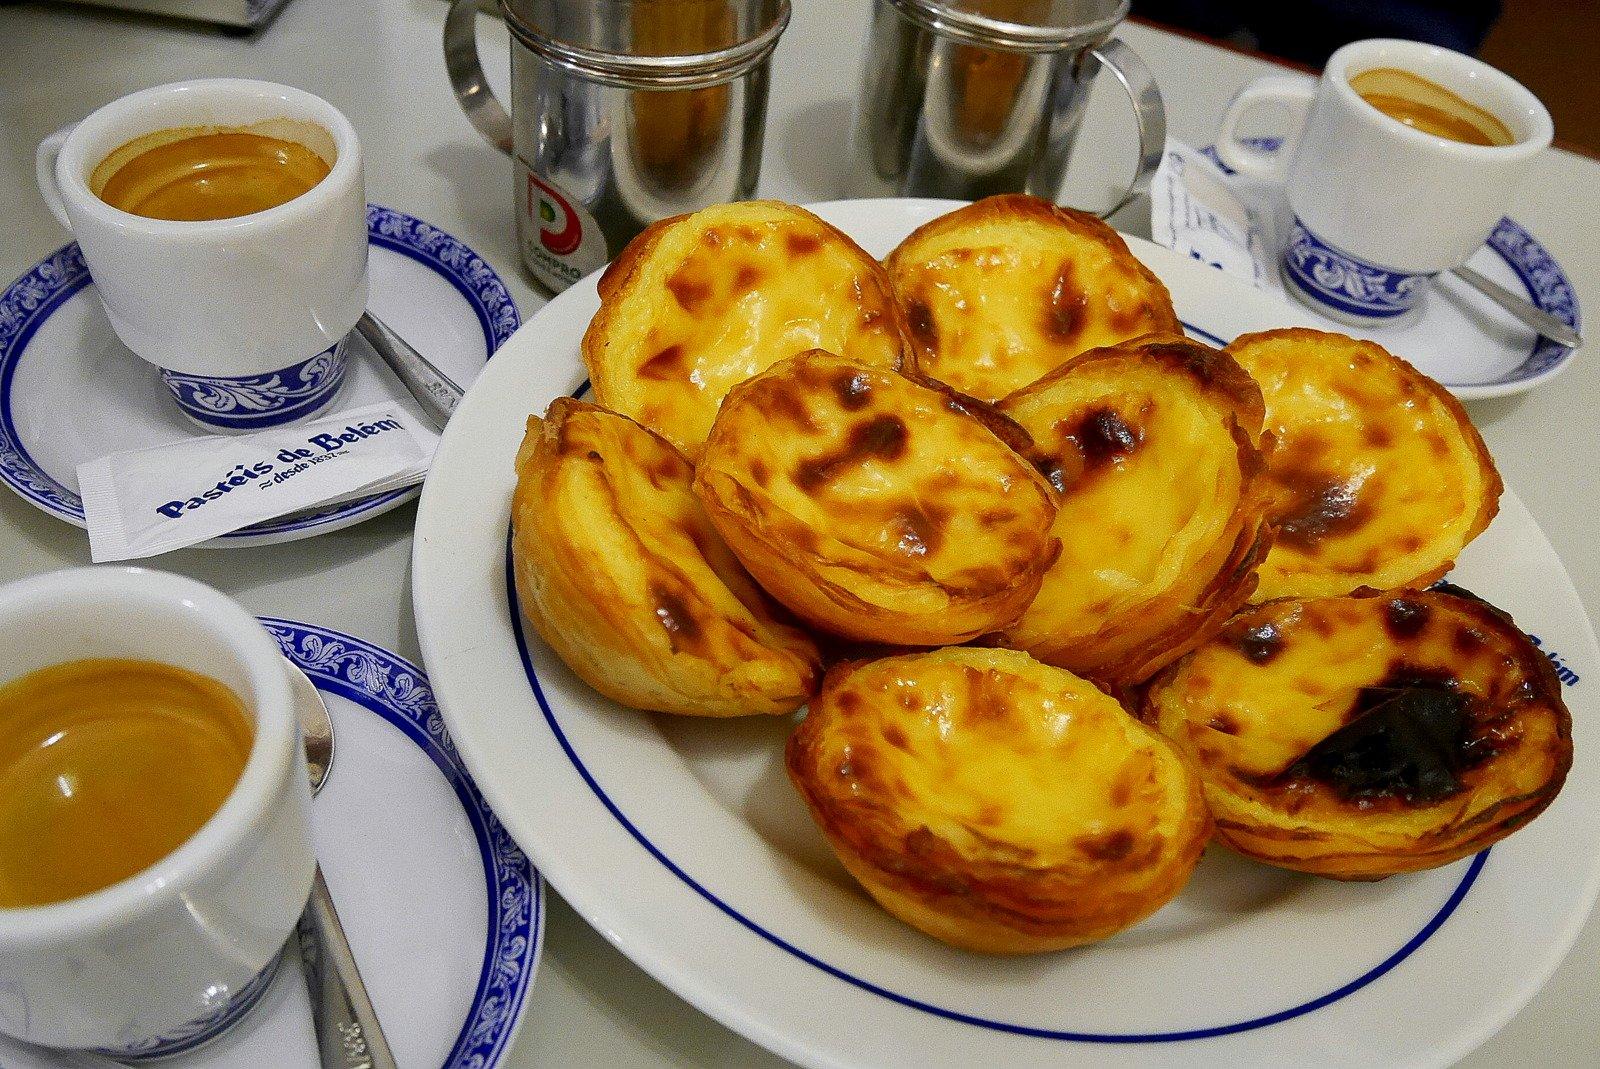 Lisboa-Pasteis-Belem-pastry-lisbon